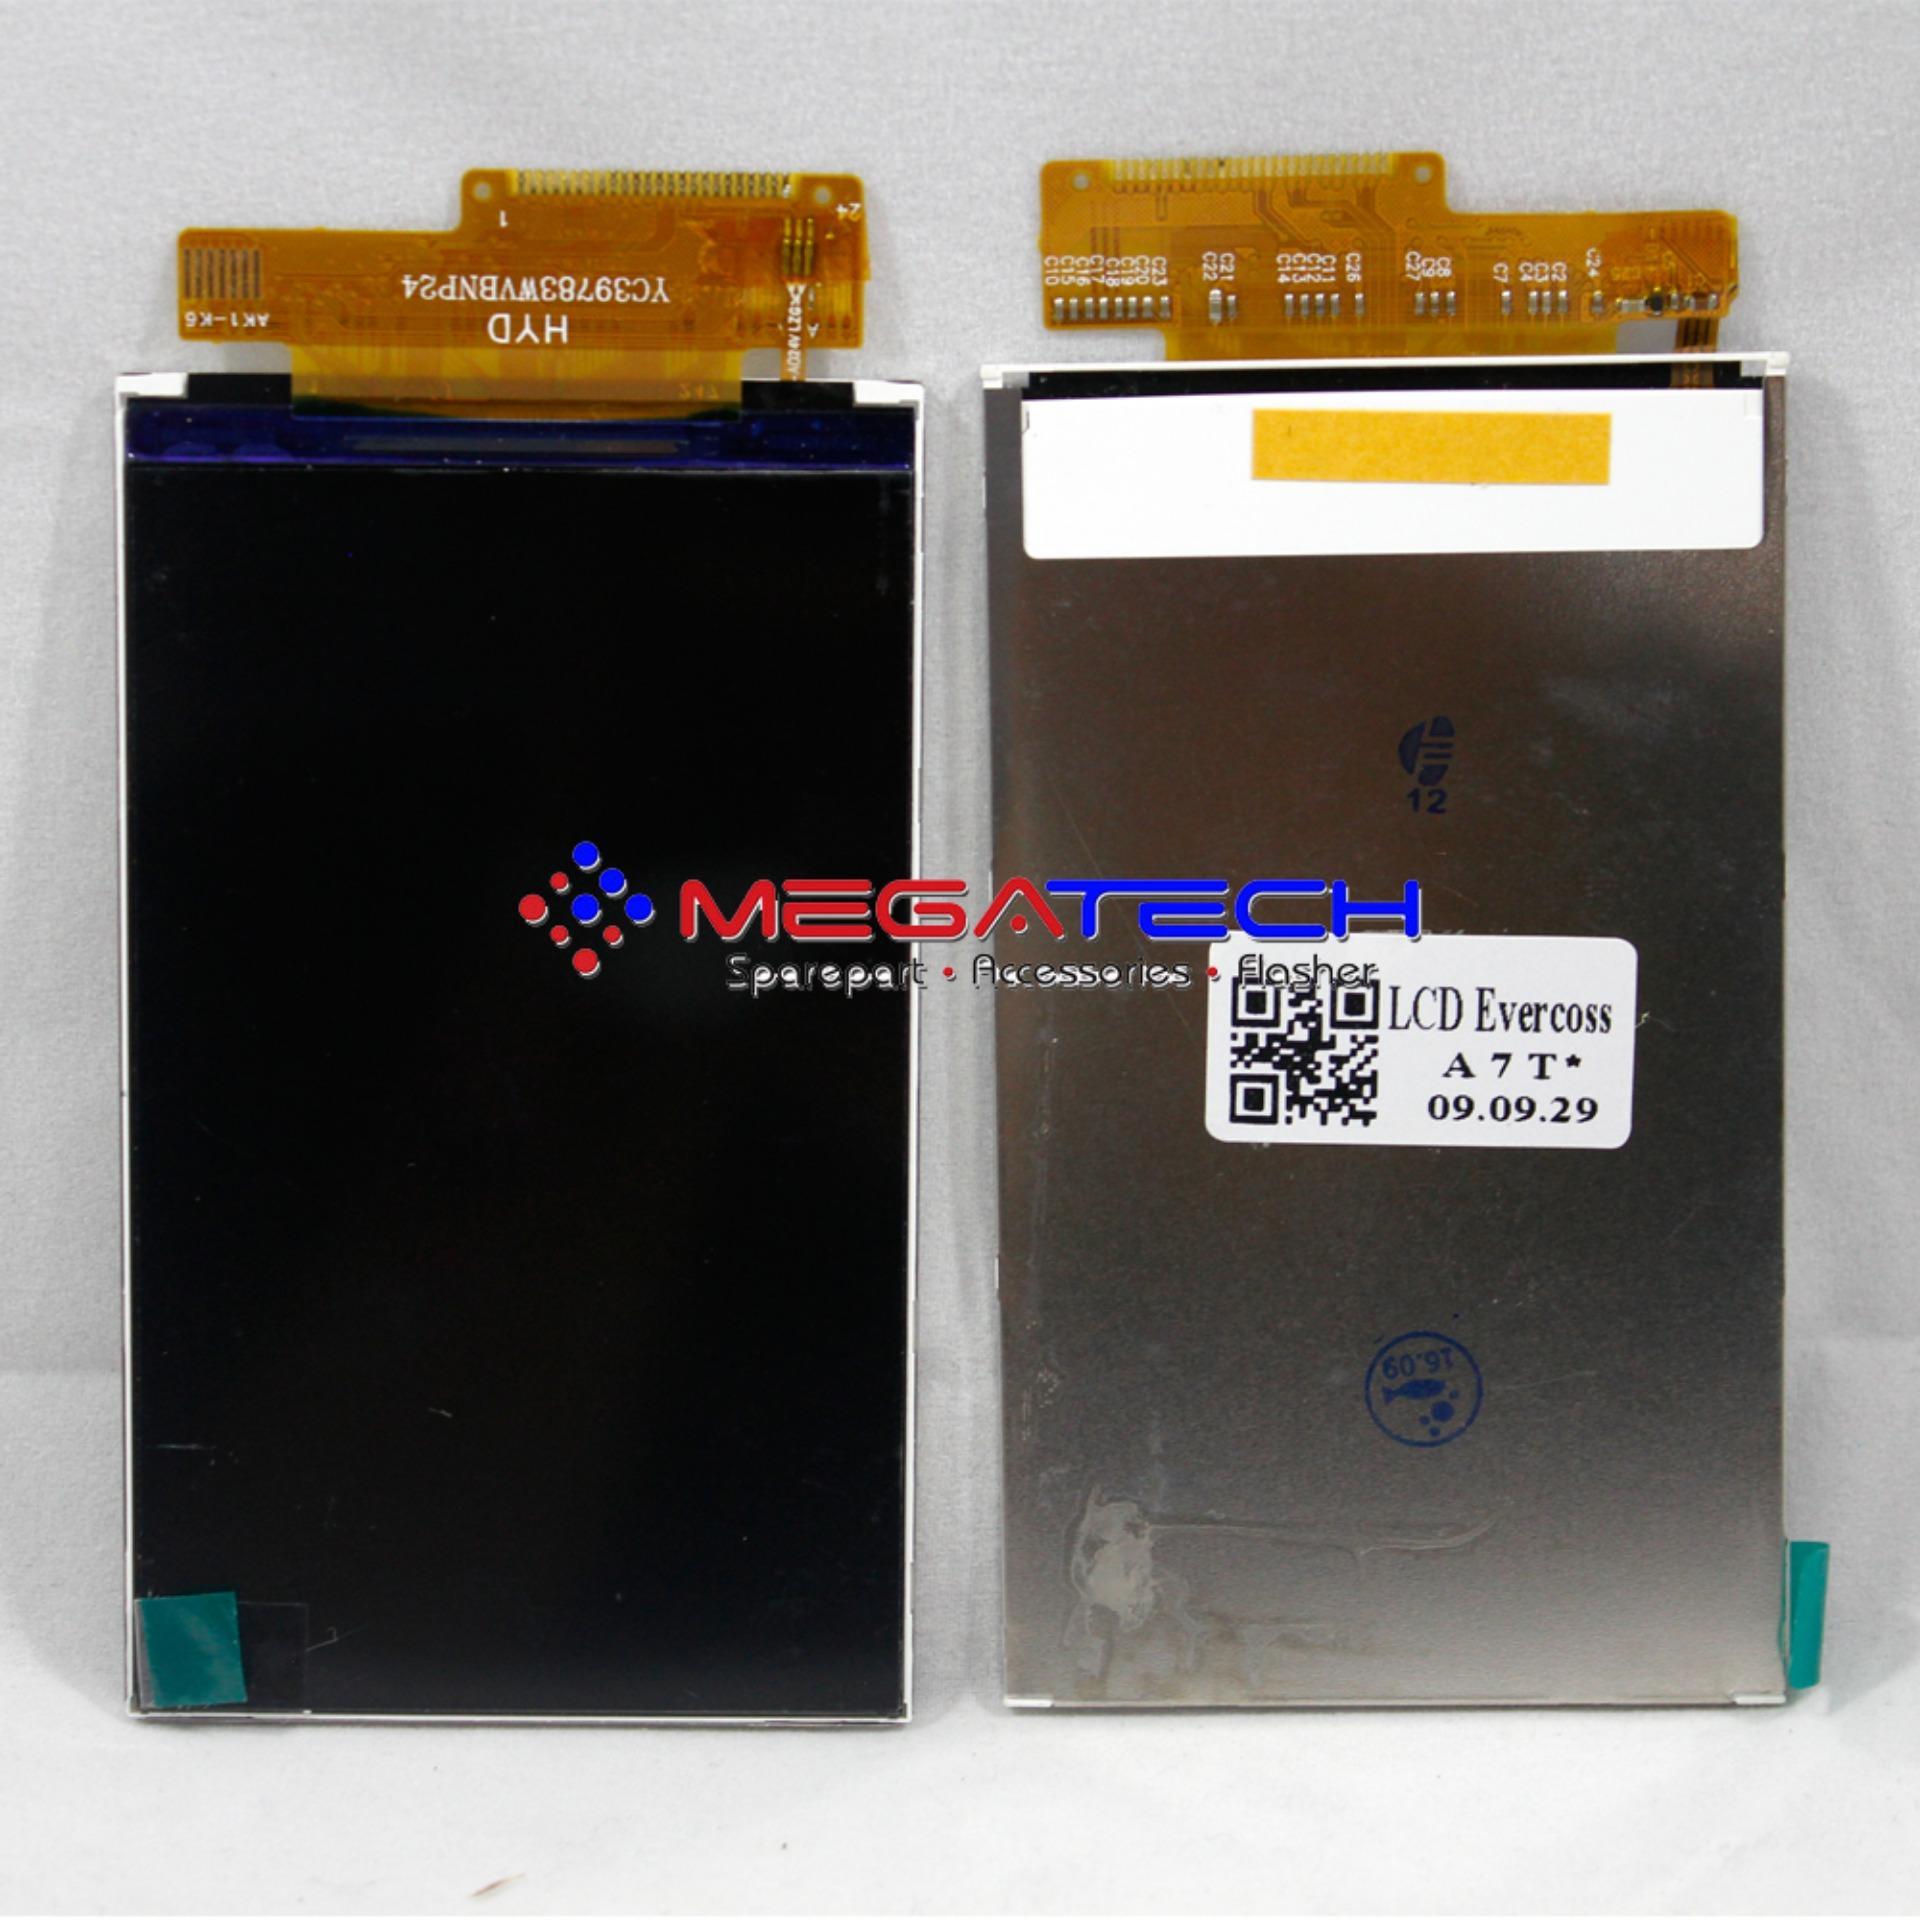 Flash Sale LCD EVERCOSS A7T*